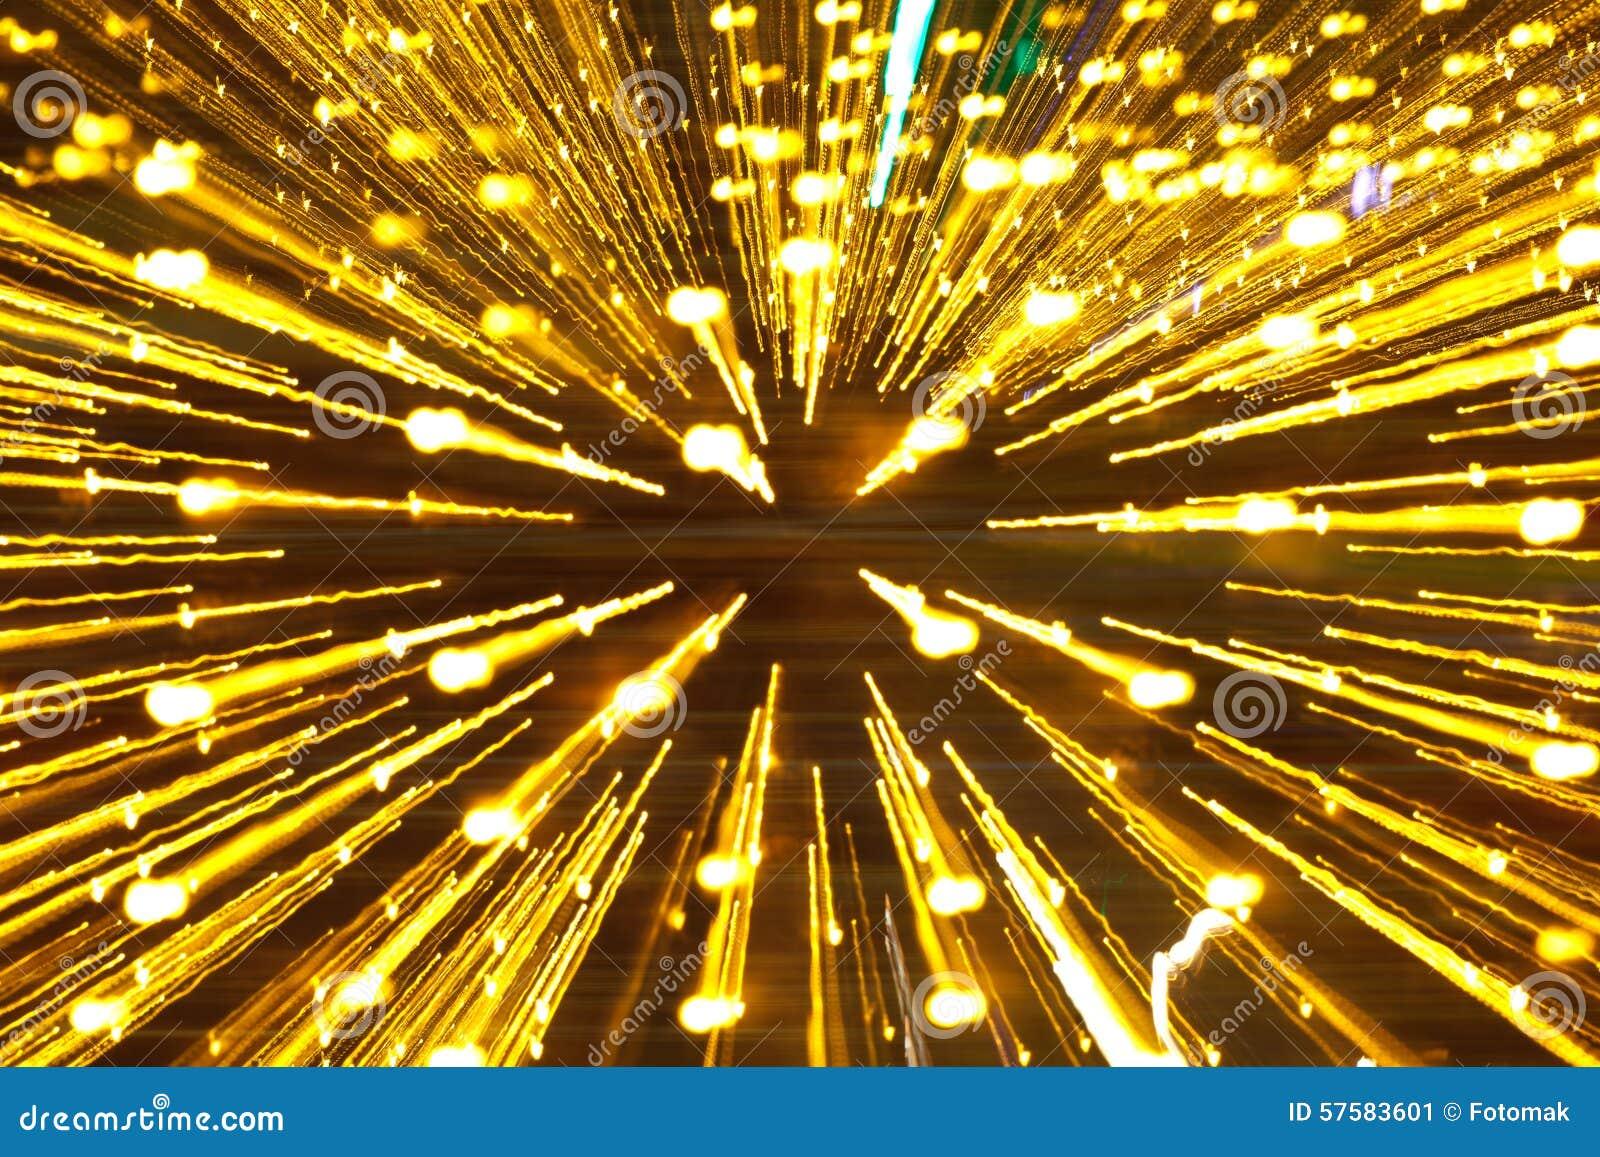 christmaslights suburban light wiki wikipedia technology new jpg file christmas